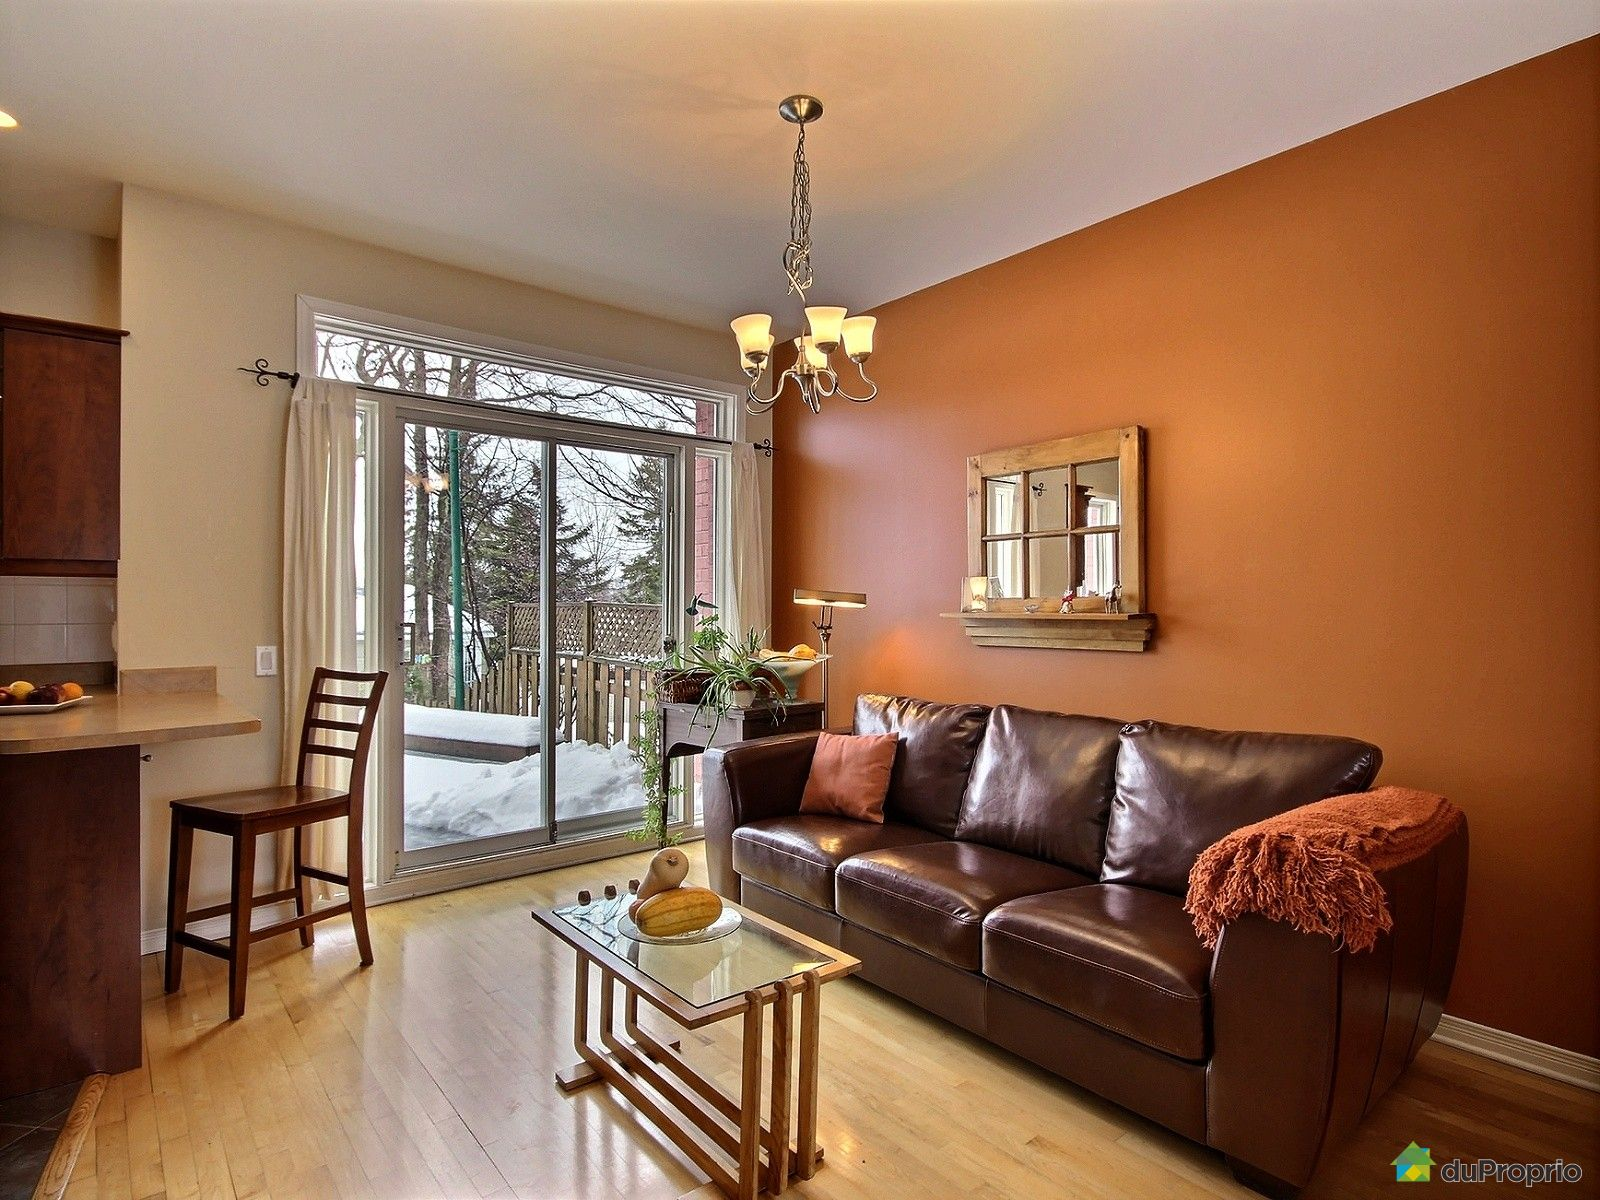 Jumel vendre longueuil 2171 rue lincourt immobilier for Golf interieur longueuil